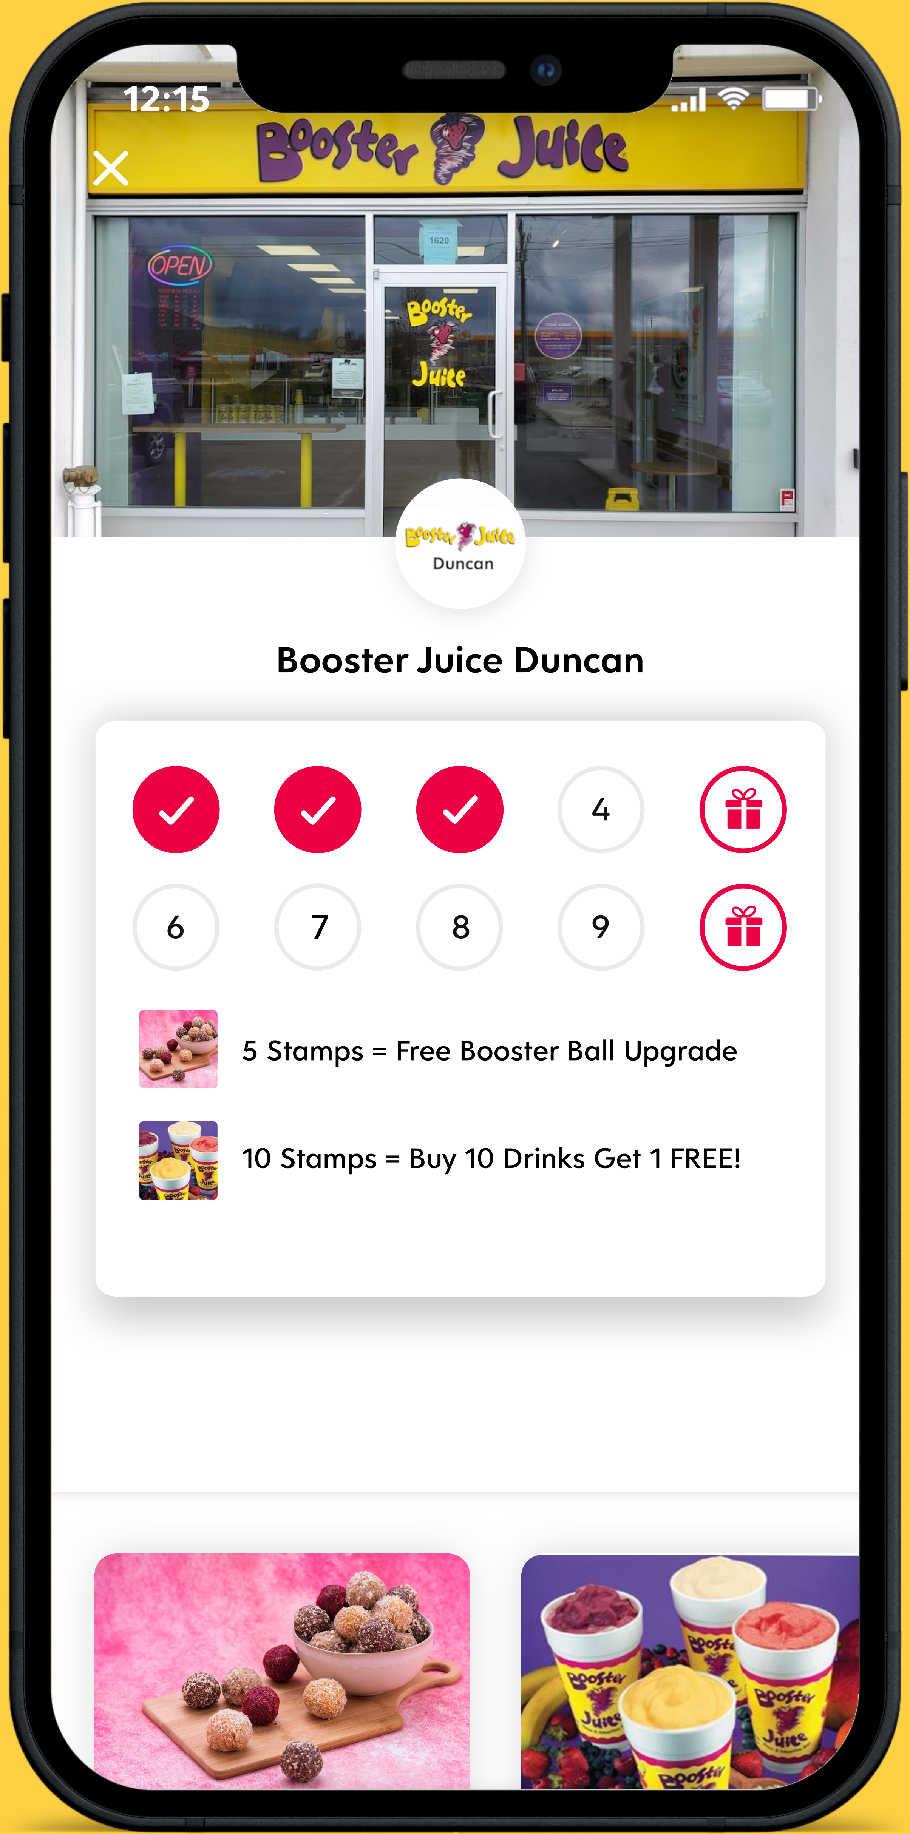 Booster Juice Duncan Flex Rewards Digital Loyalty Card Screenshot on Iphone